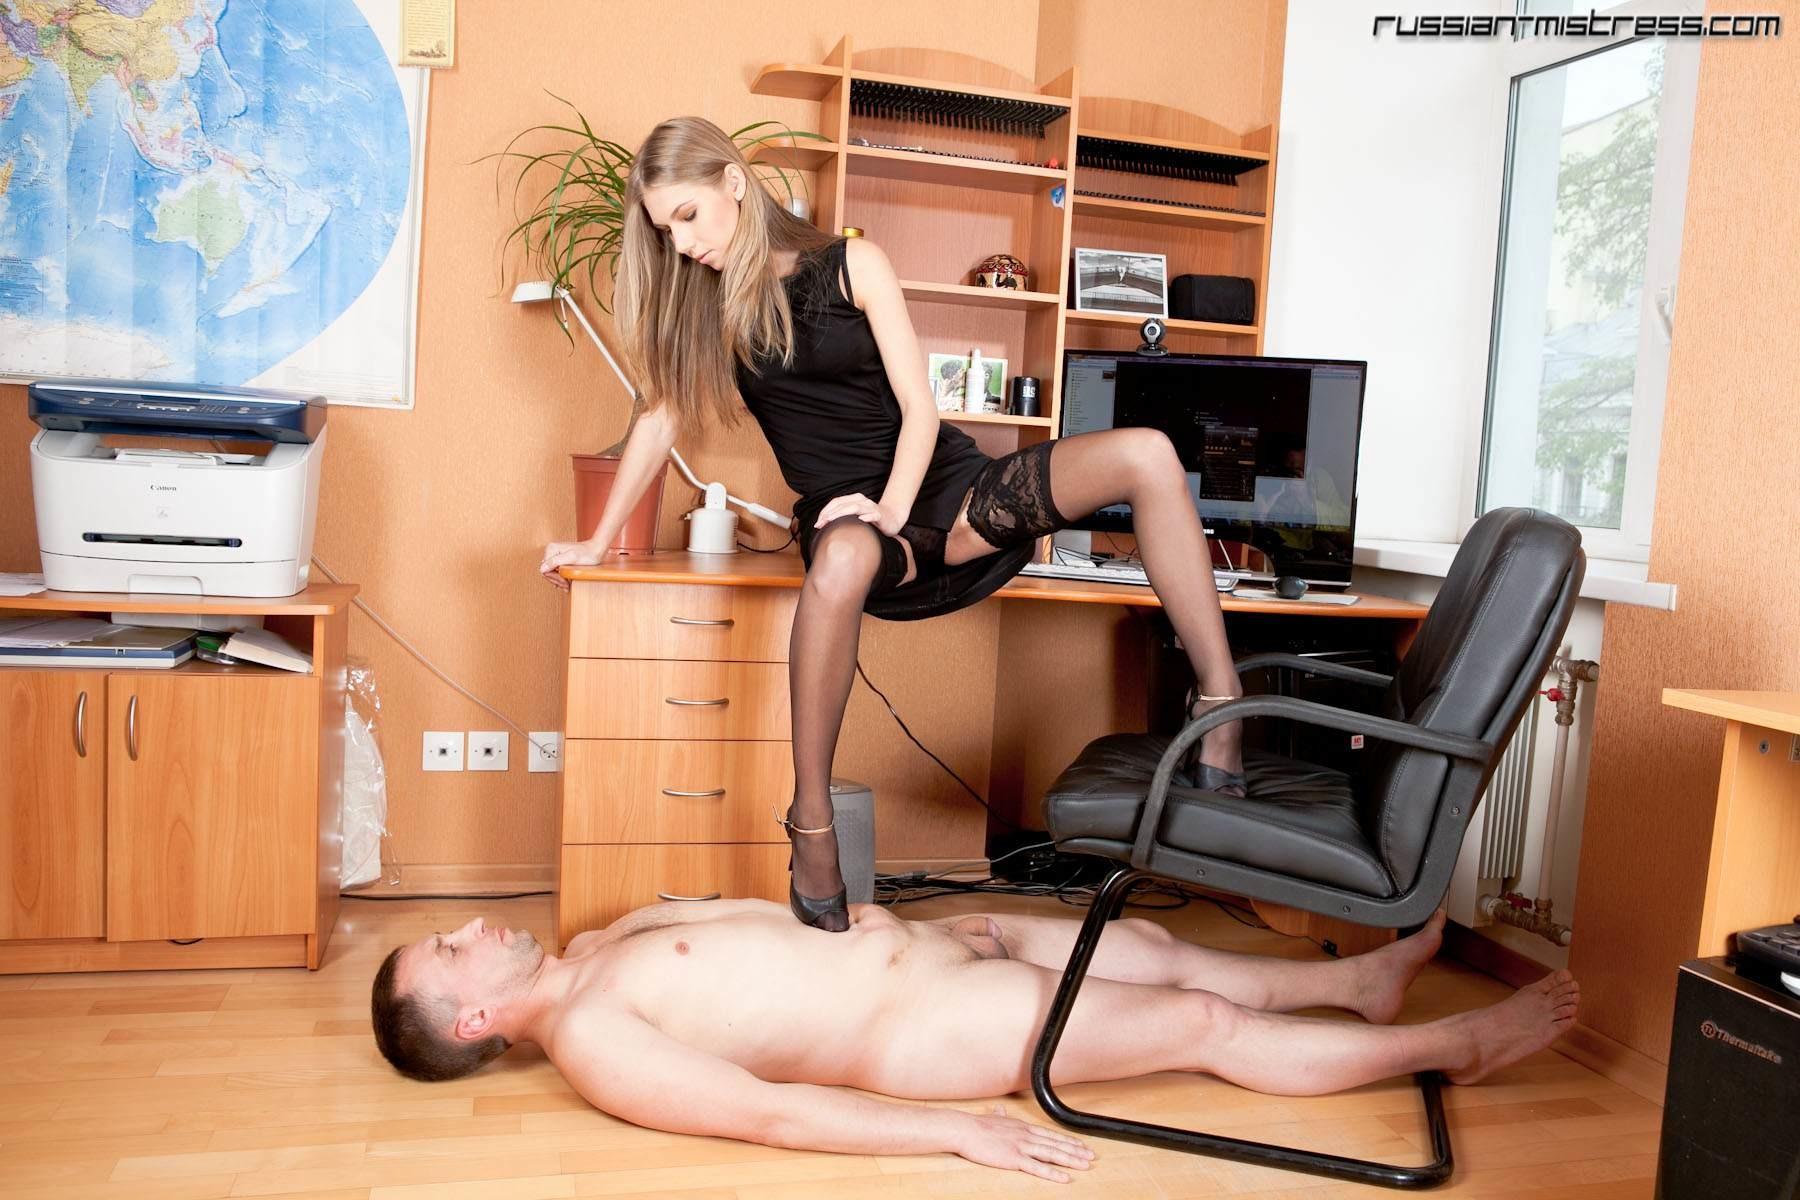 russian-bossy-lady-11